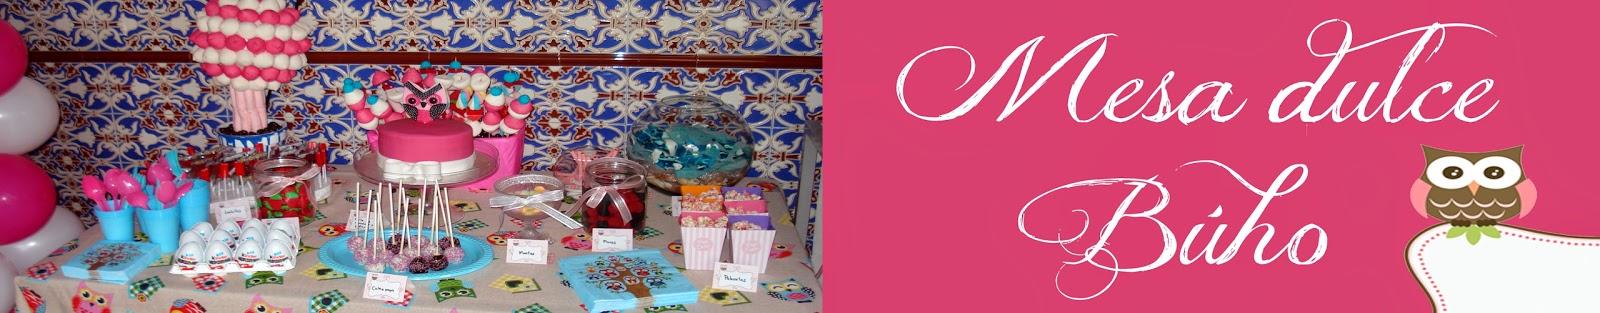 http://deliciaskawaii.blogspot.com.es/2014/05/mesa-dulce-de-comunion-buho.html